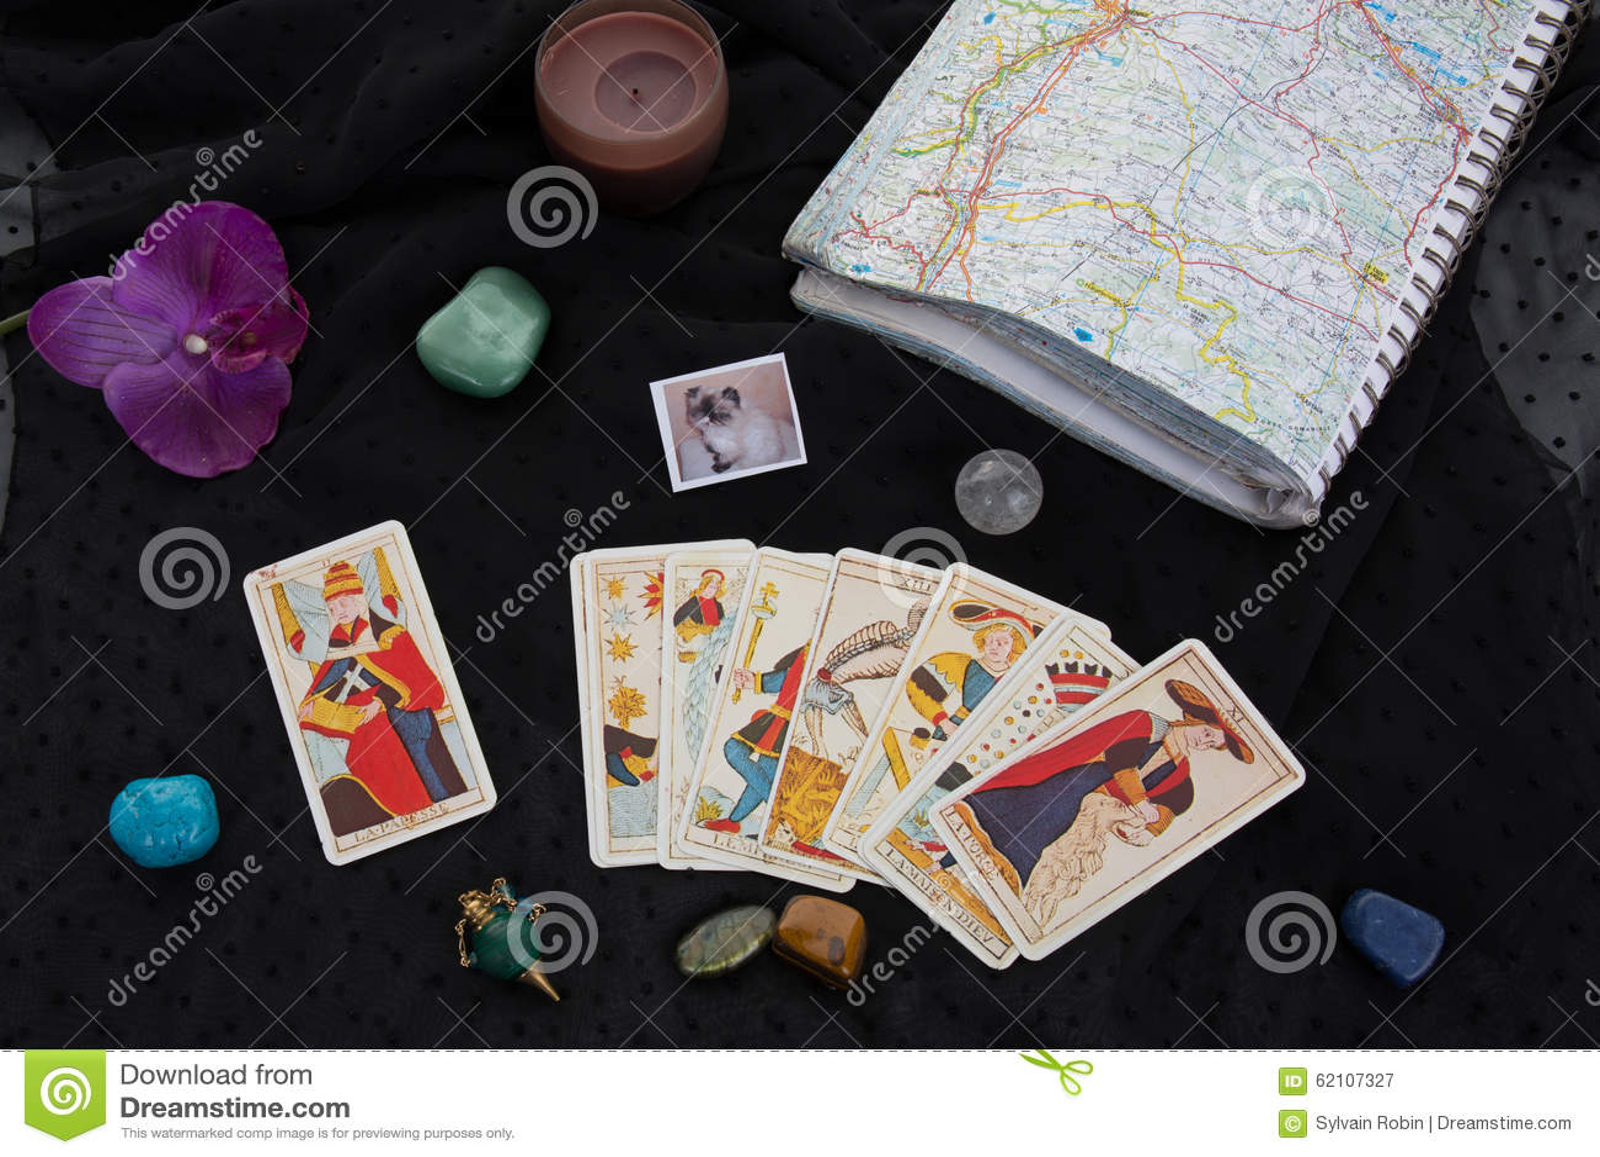 Esoteric Table With Astrological Wheel, Magic Pendulum, Tarots